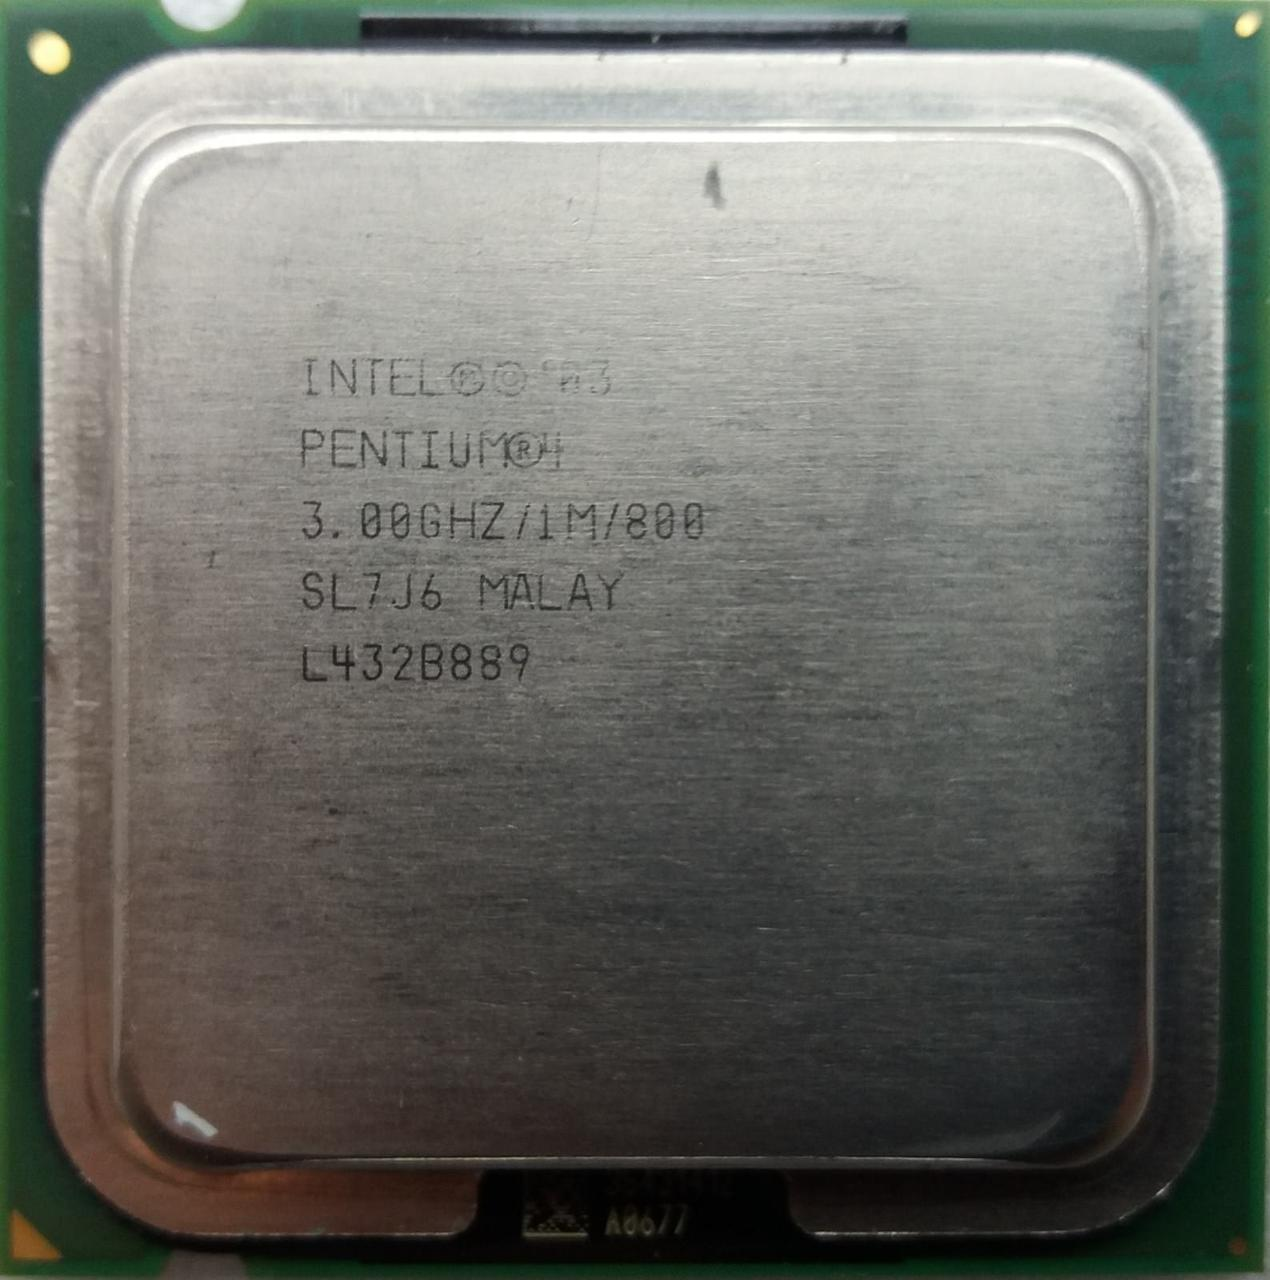 Процессор Intel Pentium 4 530 3.00GHz/1M/800 (SL7J6) s775, tray